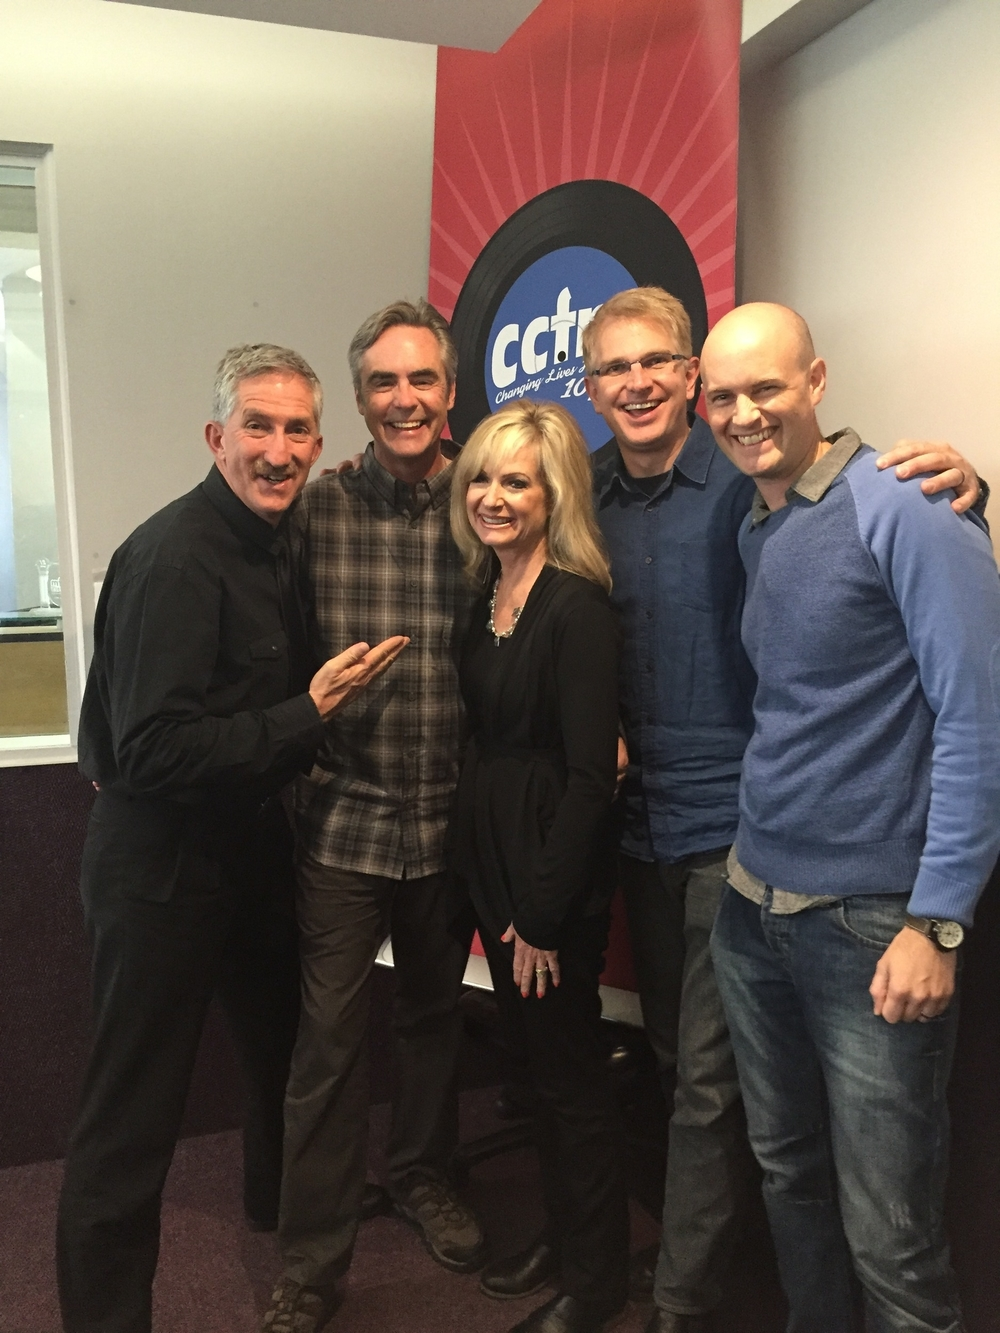 CCFM Radio Team-Jonathan, Gary, Barb, Sean, Graeme-FOTF.jpg